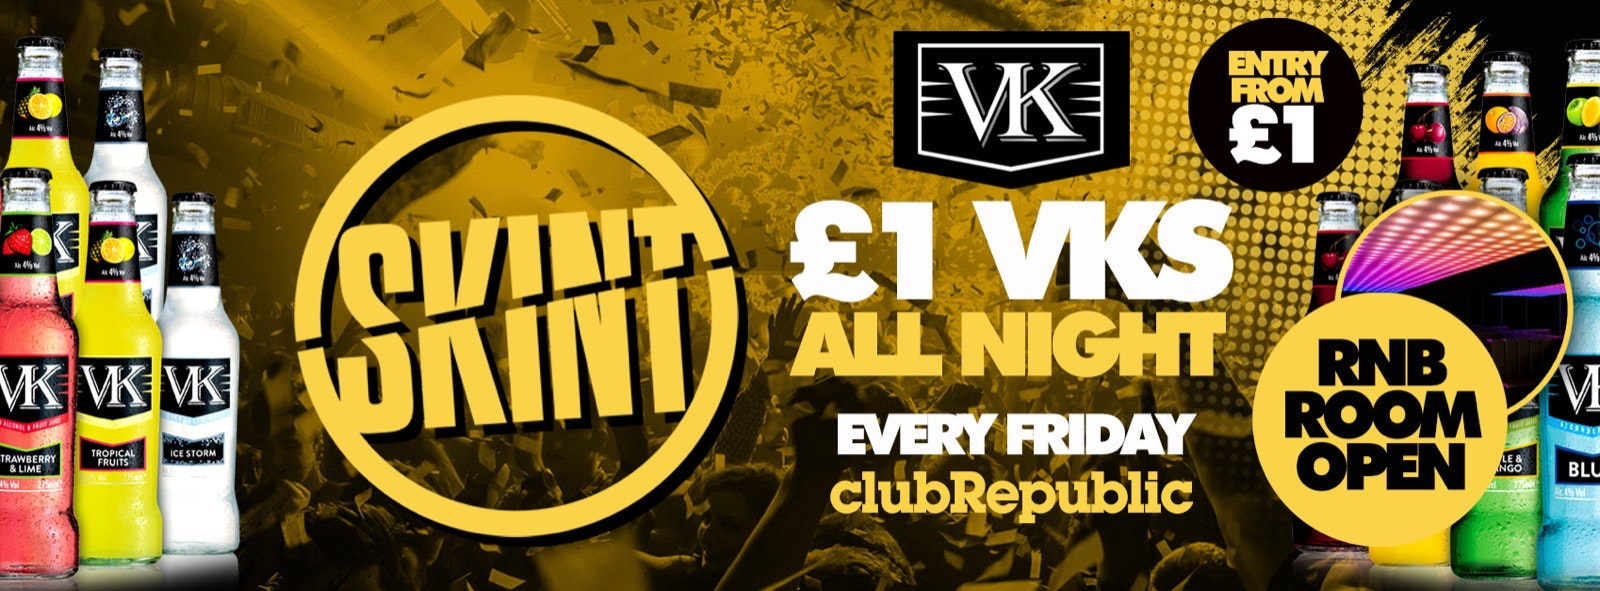 ★ Skint Fridays ★ £1 VK's Allnight! ★ Club Republic ★ £1 Tickets On Sale! ★ R&B Room Open!